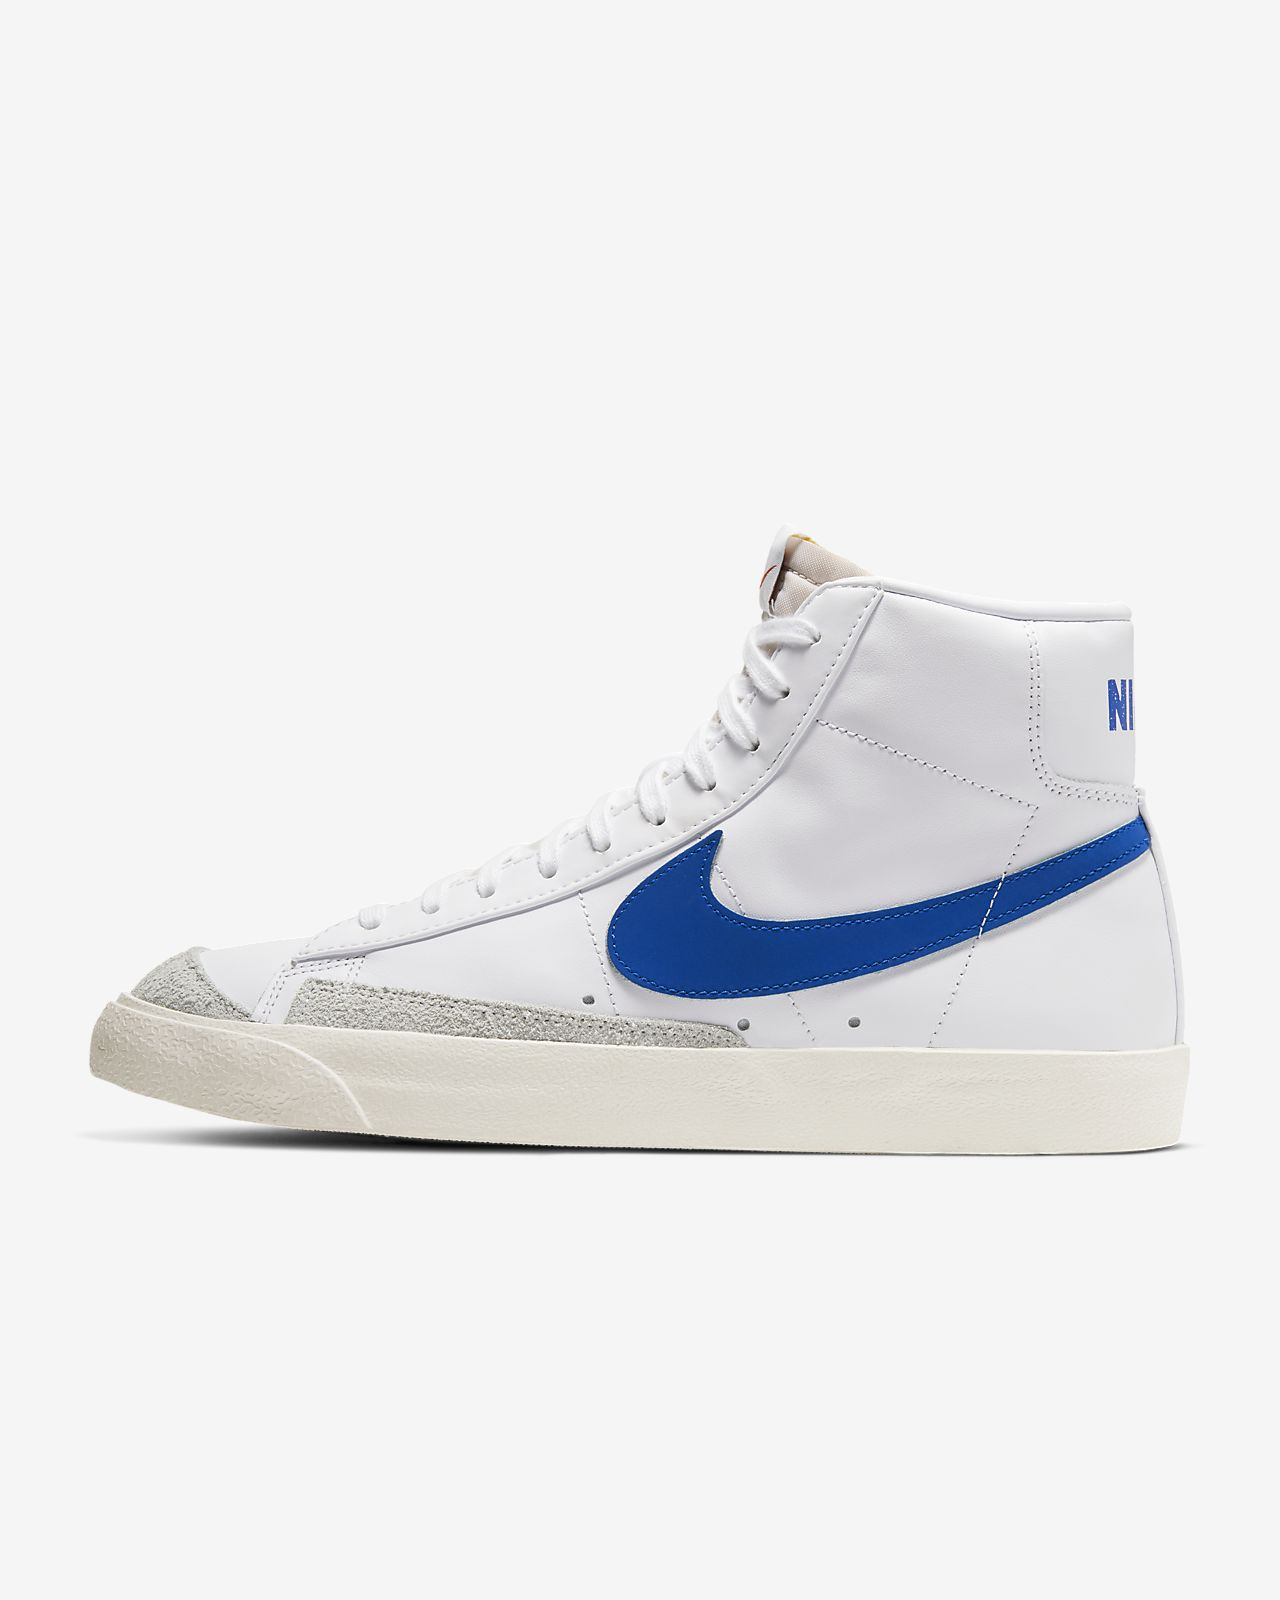 Calzado Nike Blazer Mid '77 Vintage